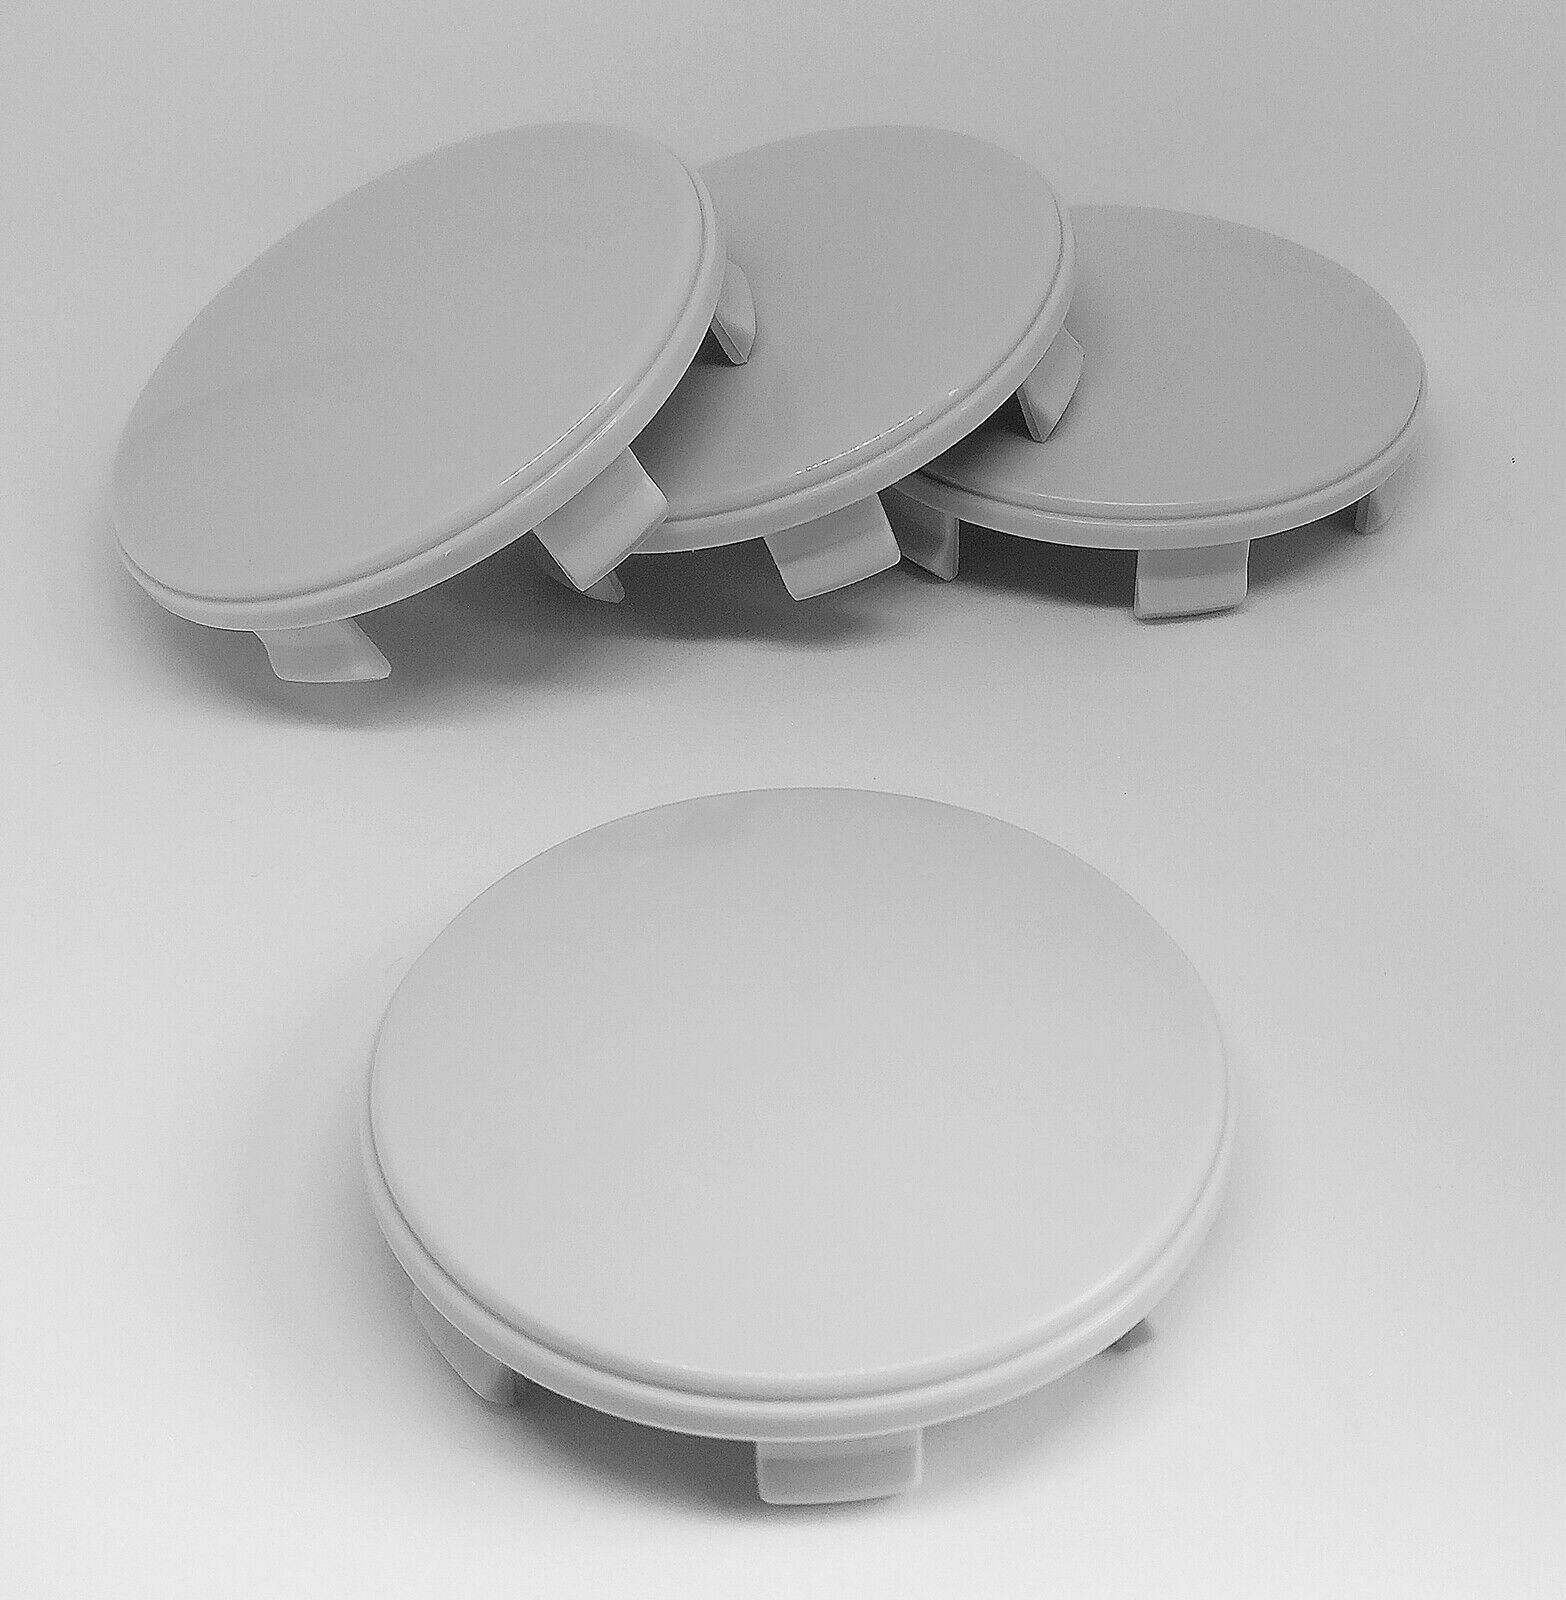 4X 60mm Nabenkappen Felgen Deckel Kappen Grau Gewölbt für Brock RC Design Platin